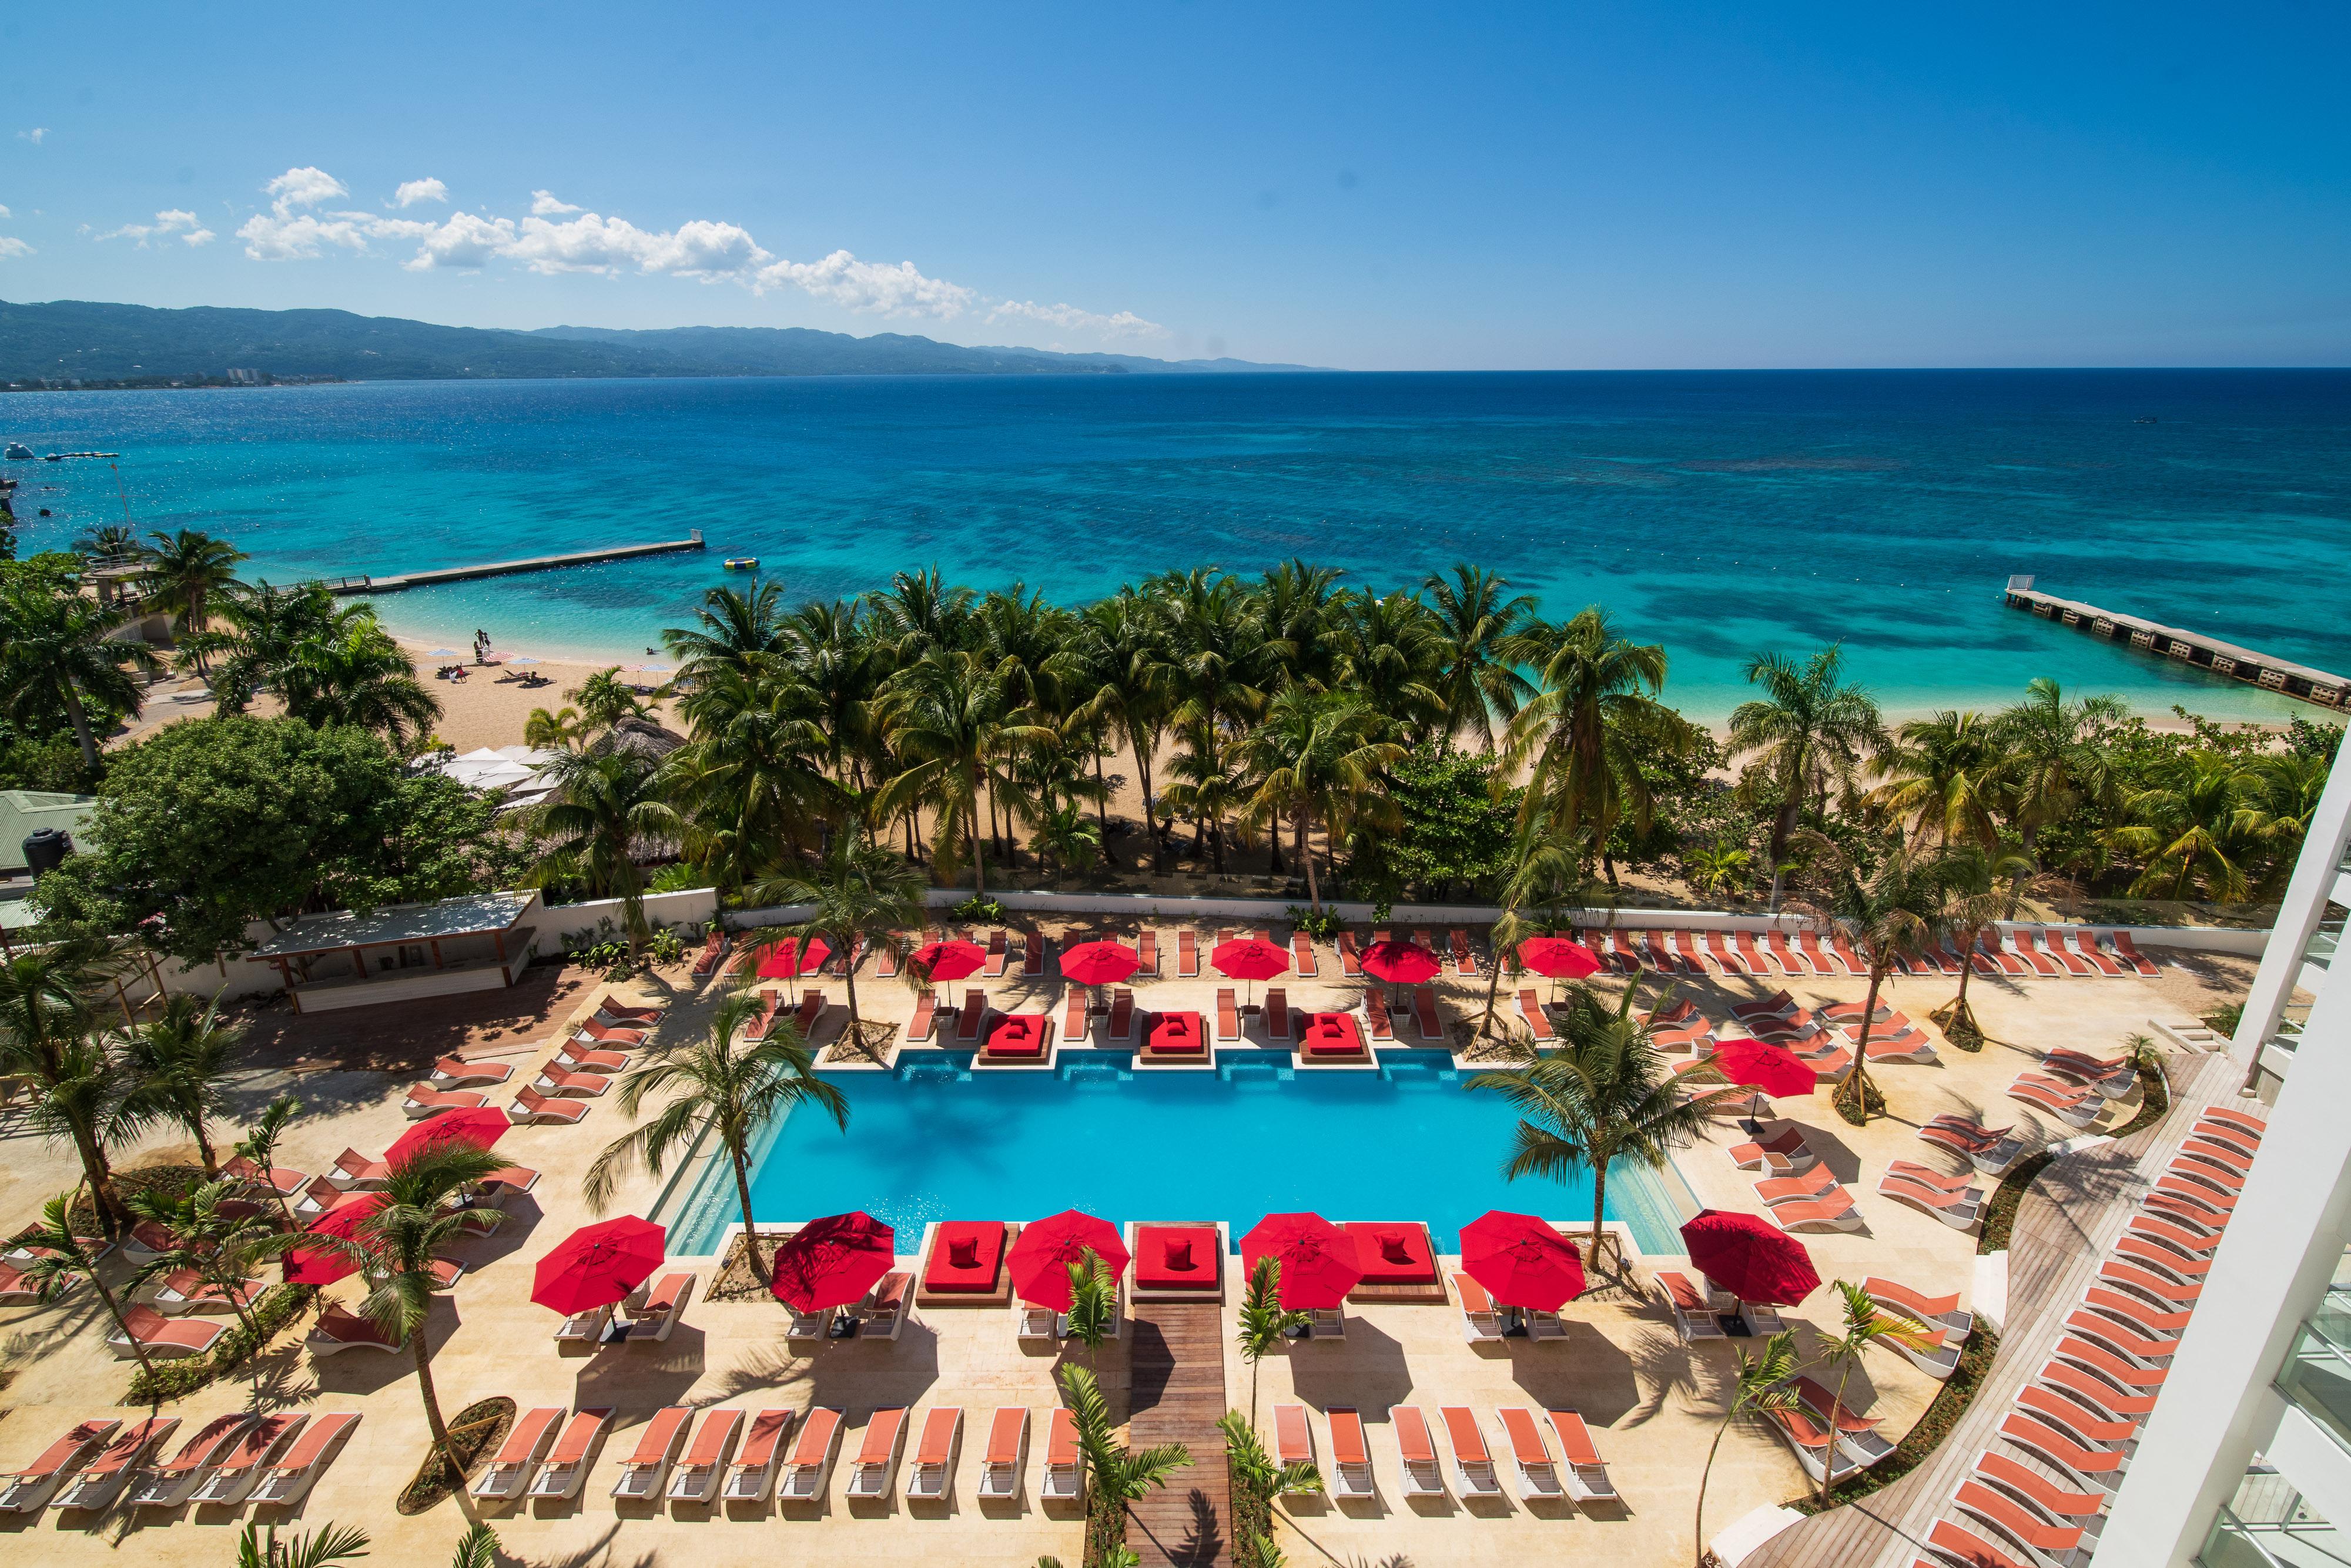 S Hotel Jamaica Main Pool Deck SCP2-107